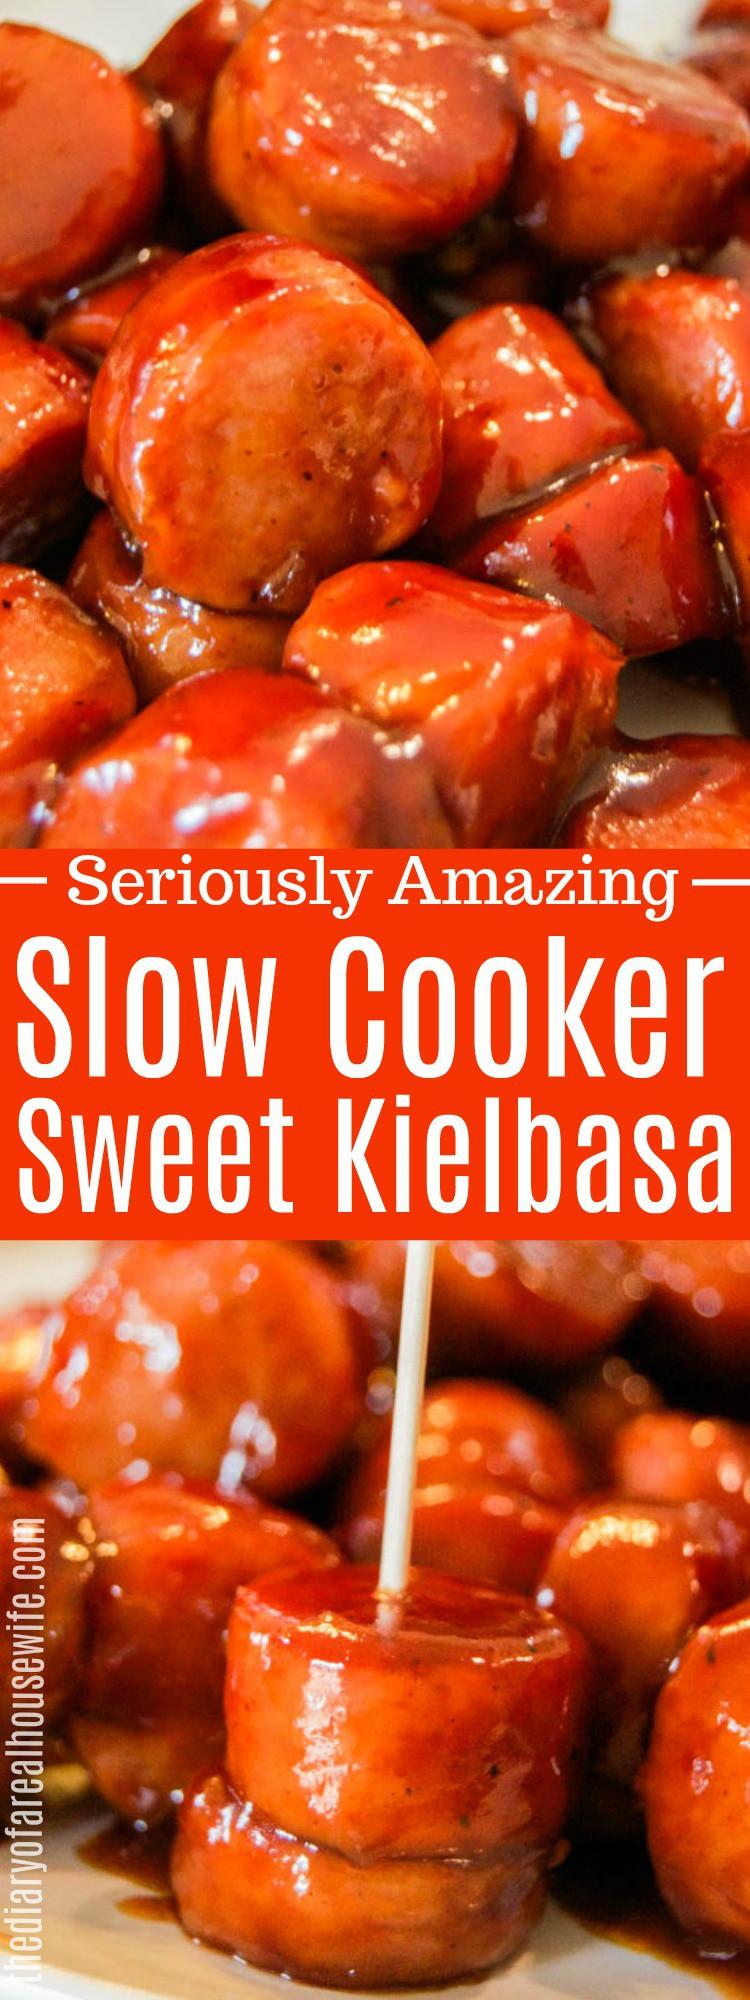 Slow Cooker Sweet Kielbasa